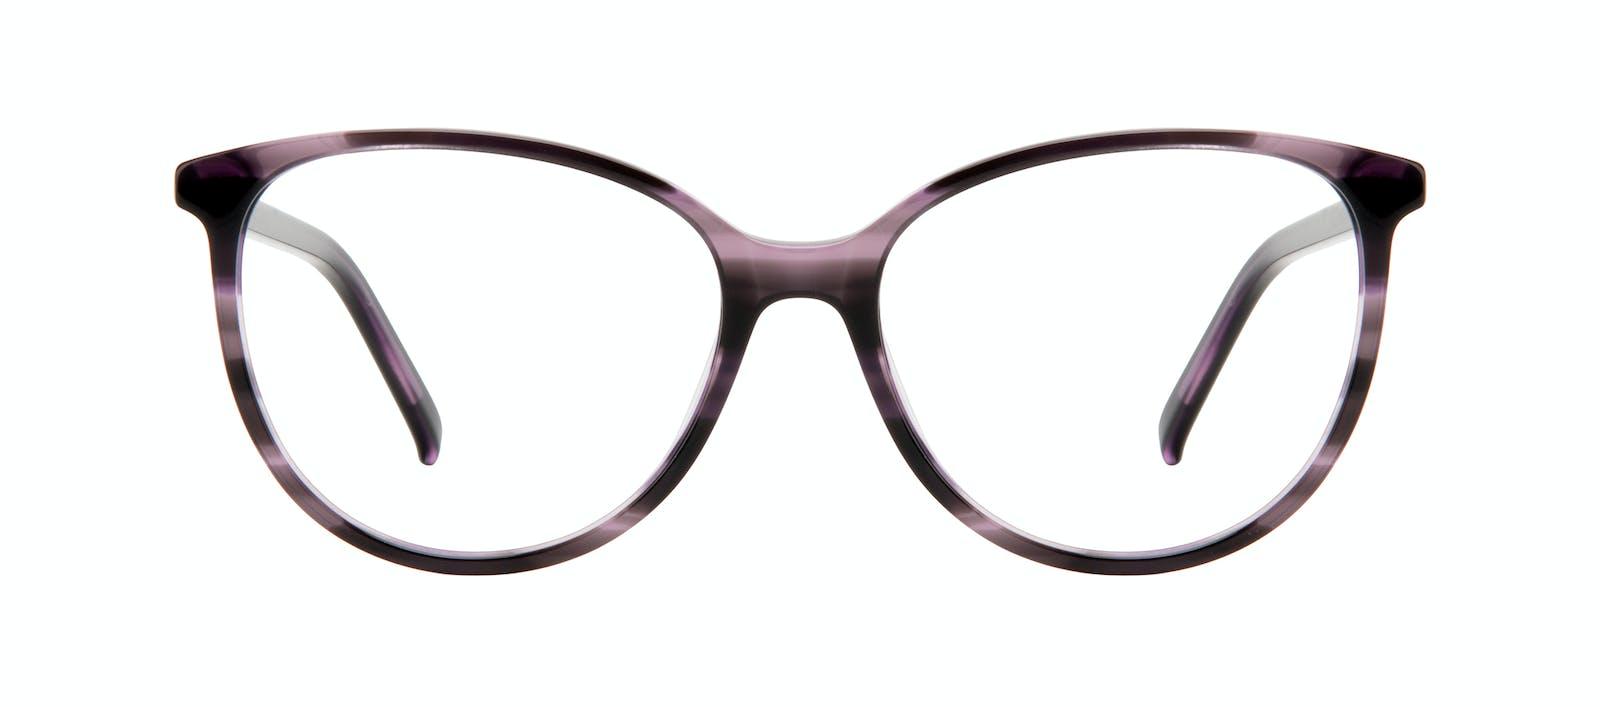 566511b1a54c45 Affordable Fashion Glasses Cat Eye Round Eyeglasses Women Imagine Leopard  Face